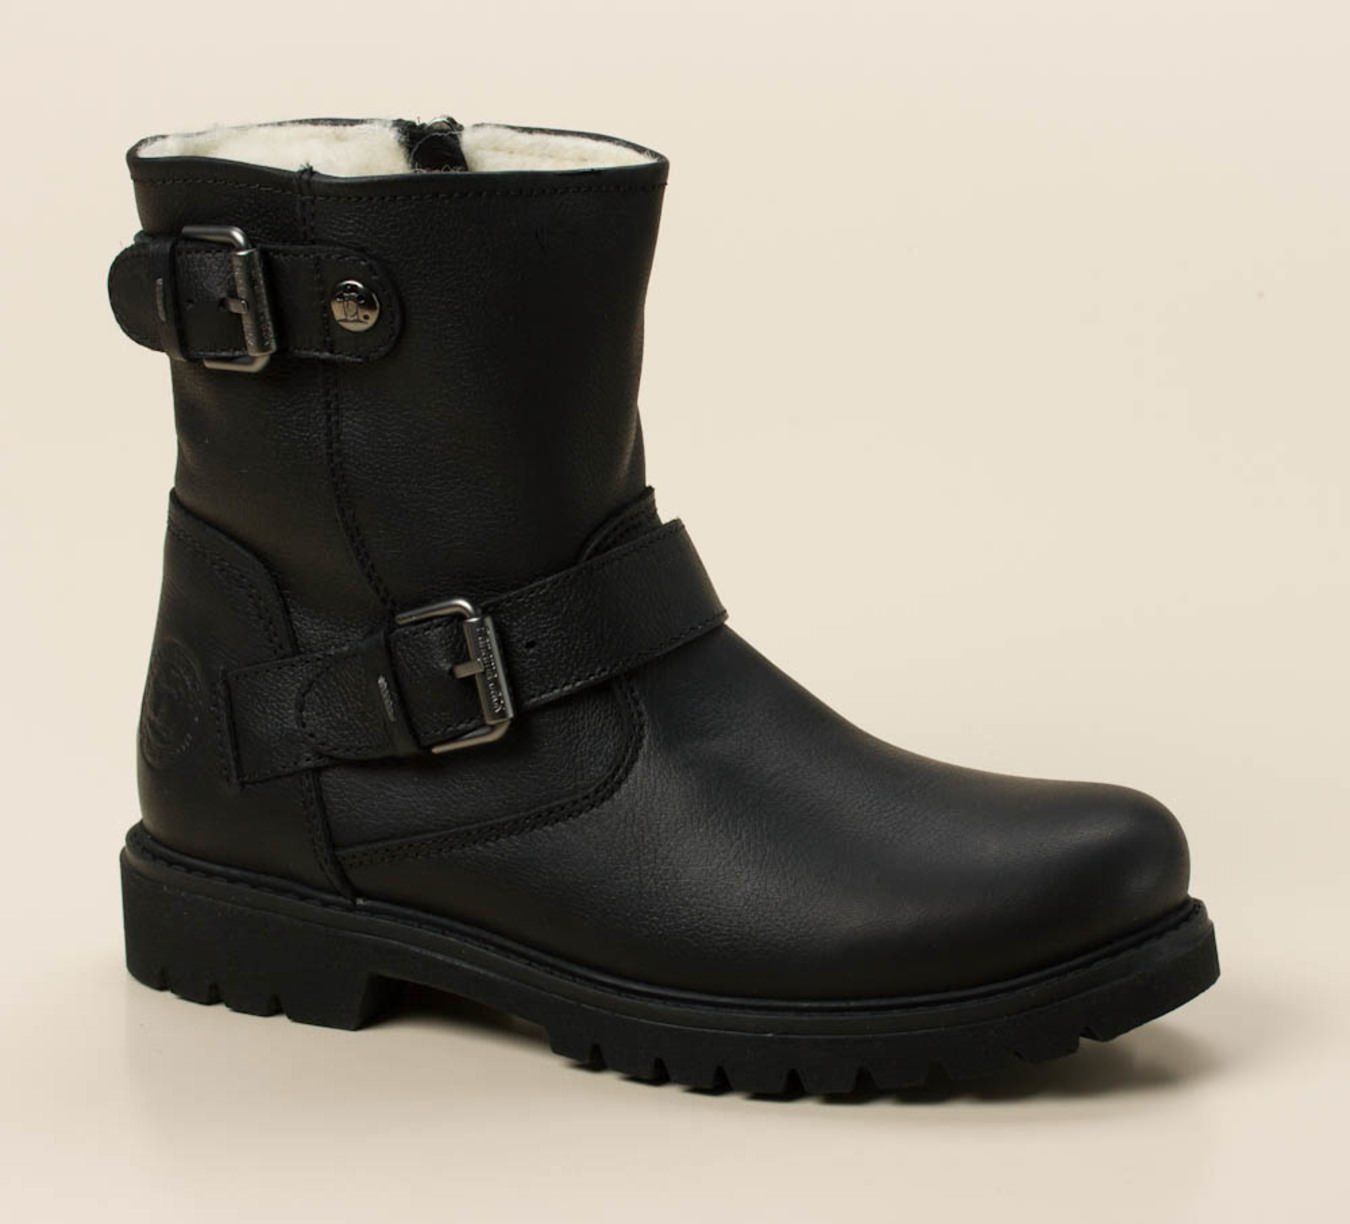 42e0c5dd942c8a Panama Jack Damen Stiefelette in schwarz kaufen